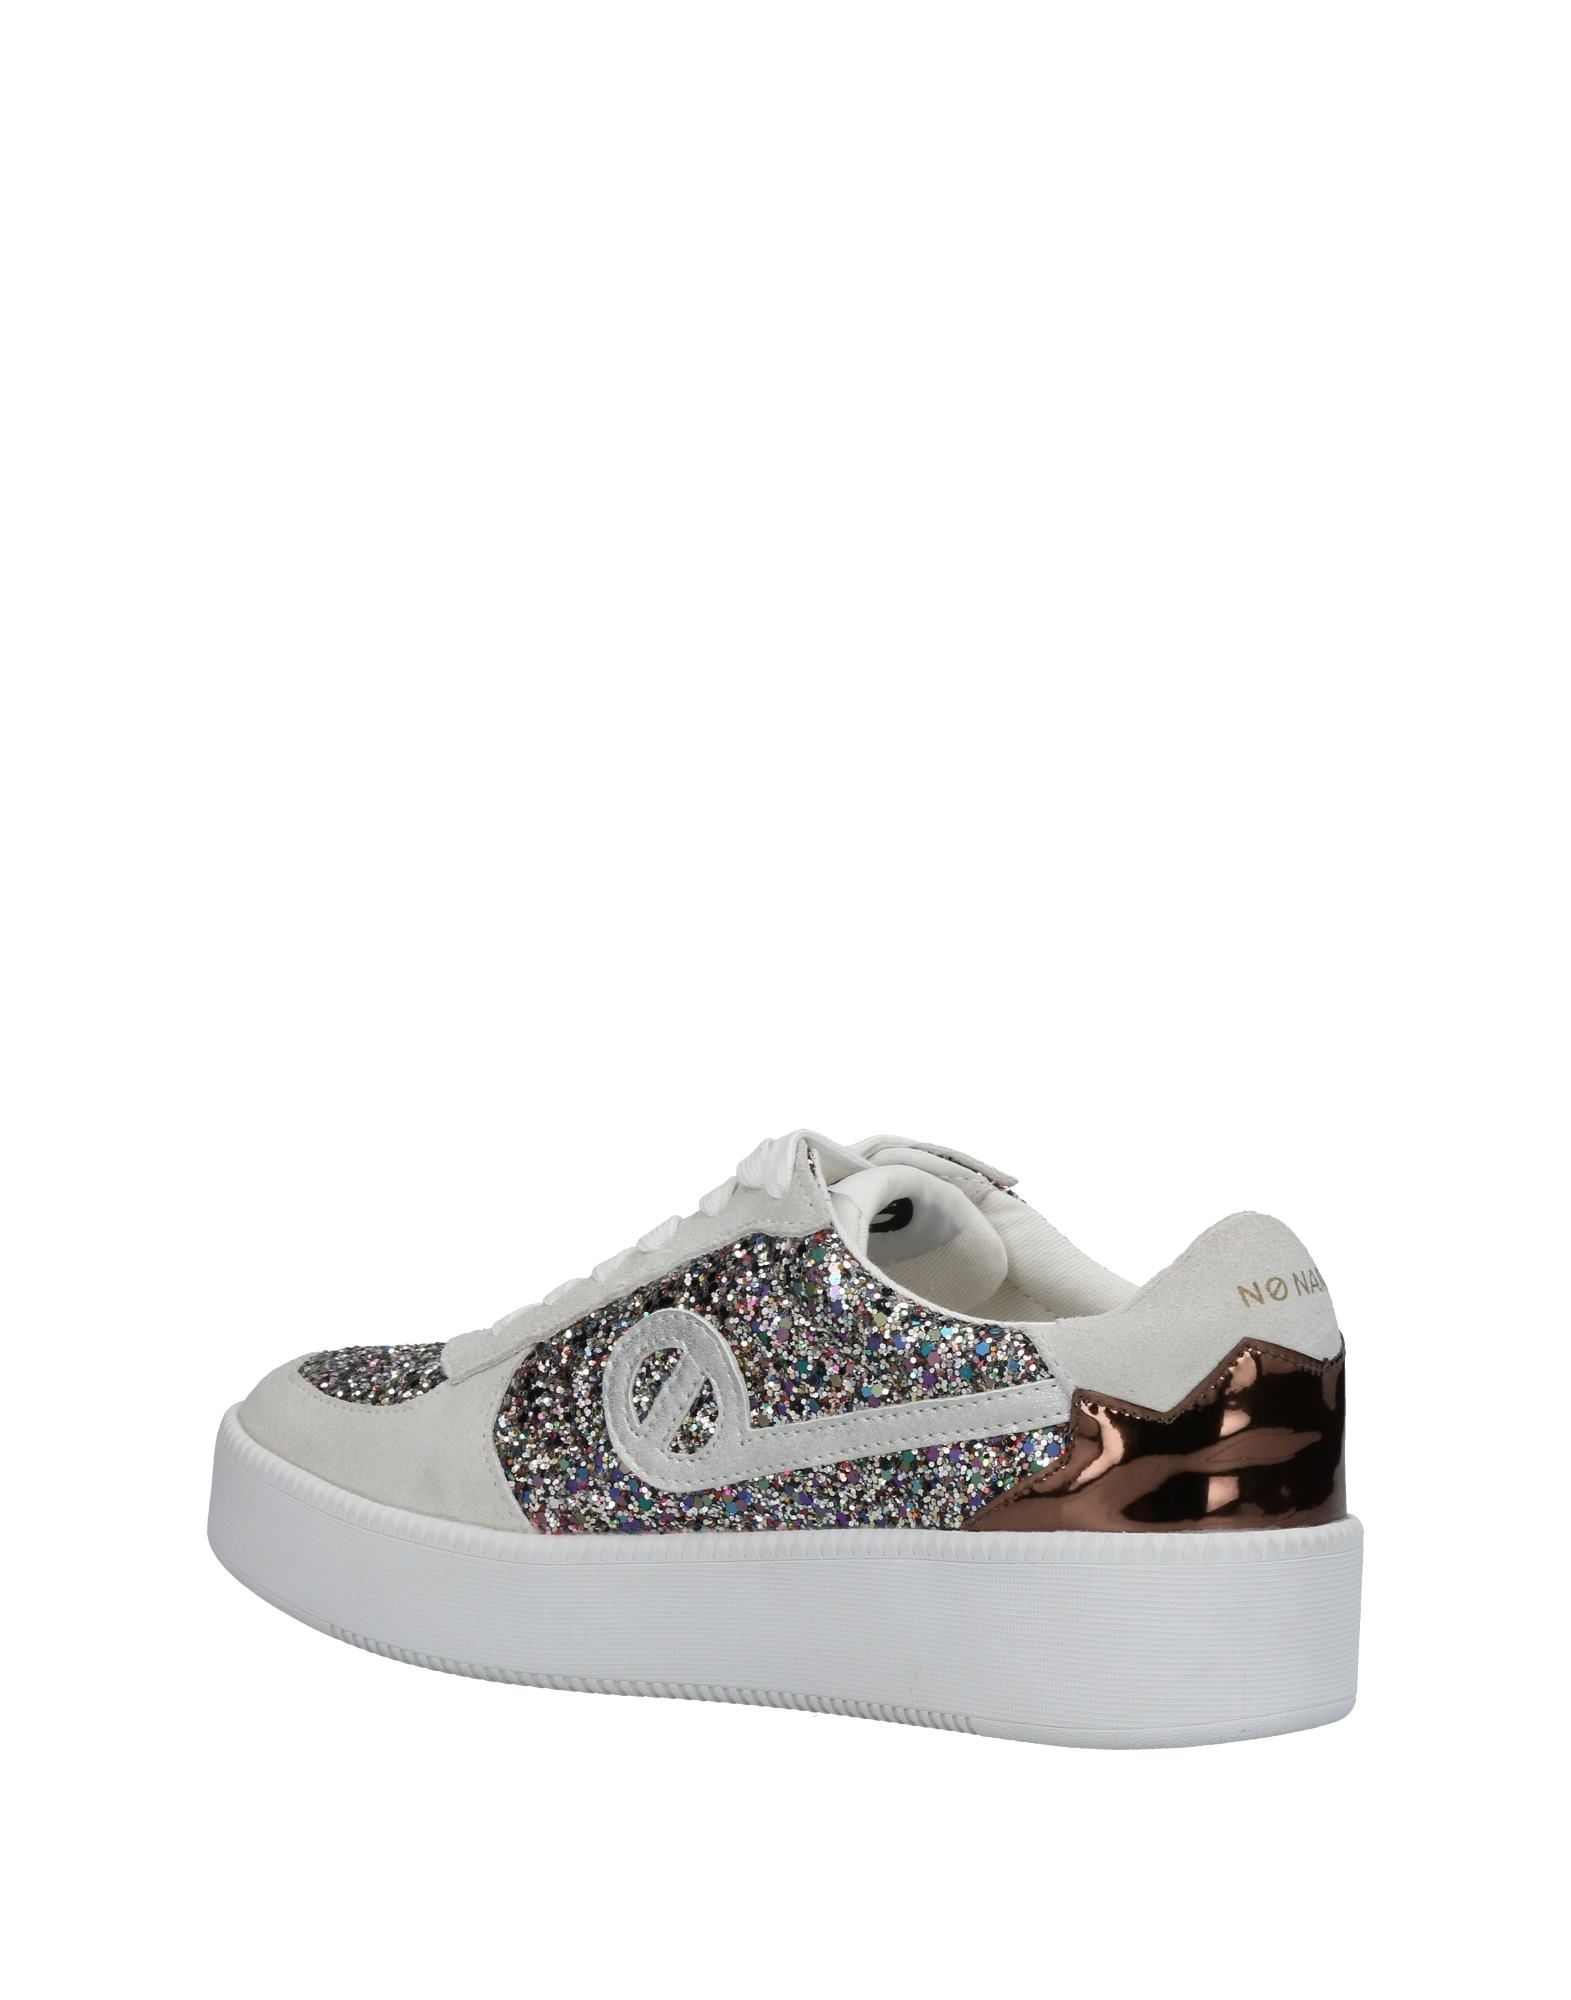 No Preis-Leistungs-Verhältnis, Name Sneakers Damen Gutes Preis-Leistungs-Verhältnis, No es lohnt sich db33e0